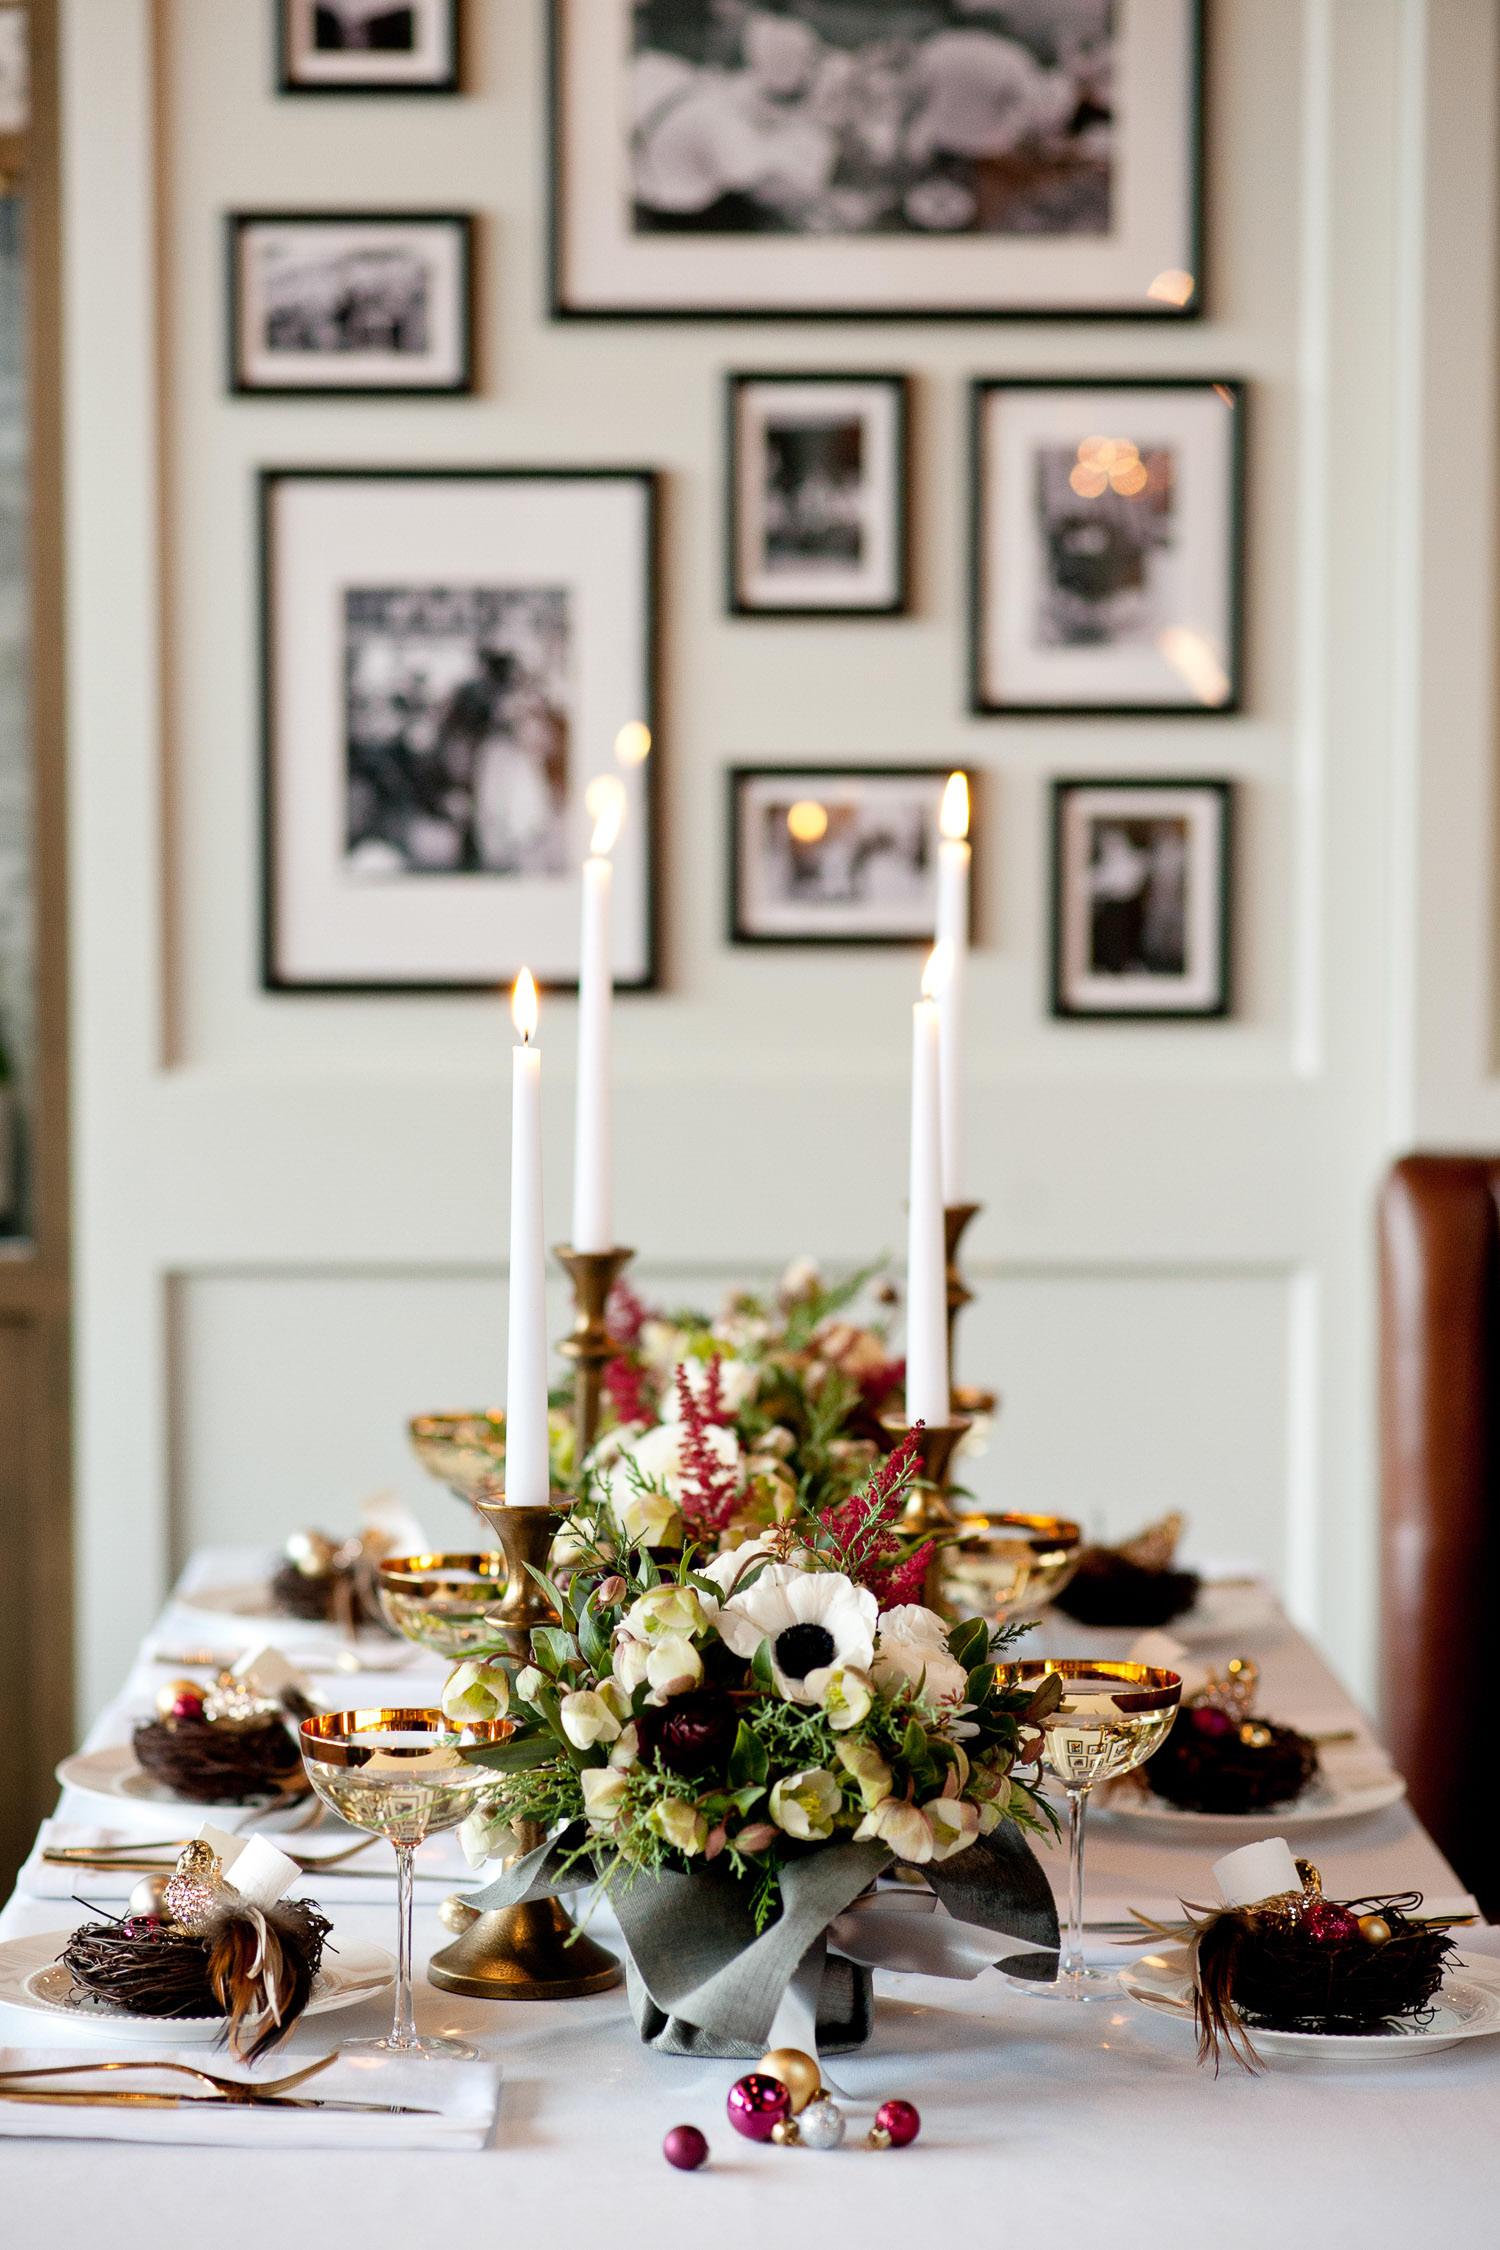 table at Royale Calgary wedding captured by Calgary wedding photographer Tara Whittaker